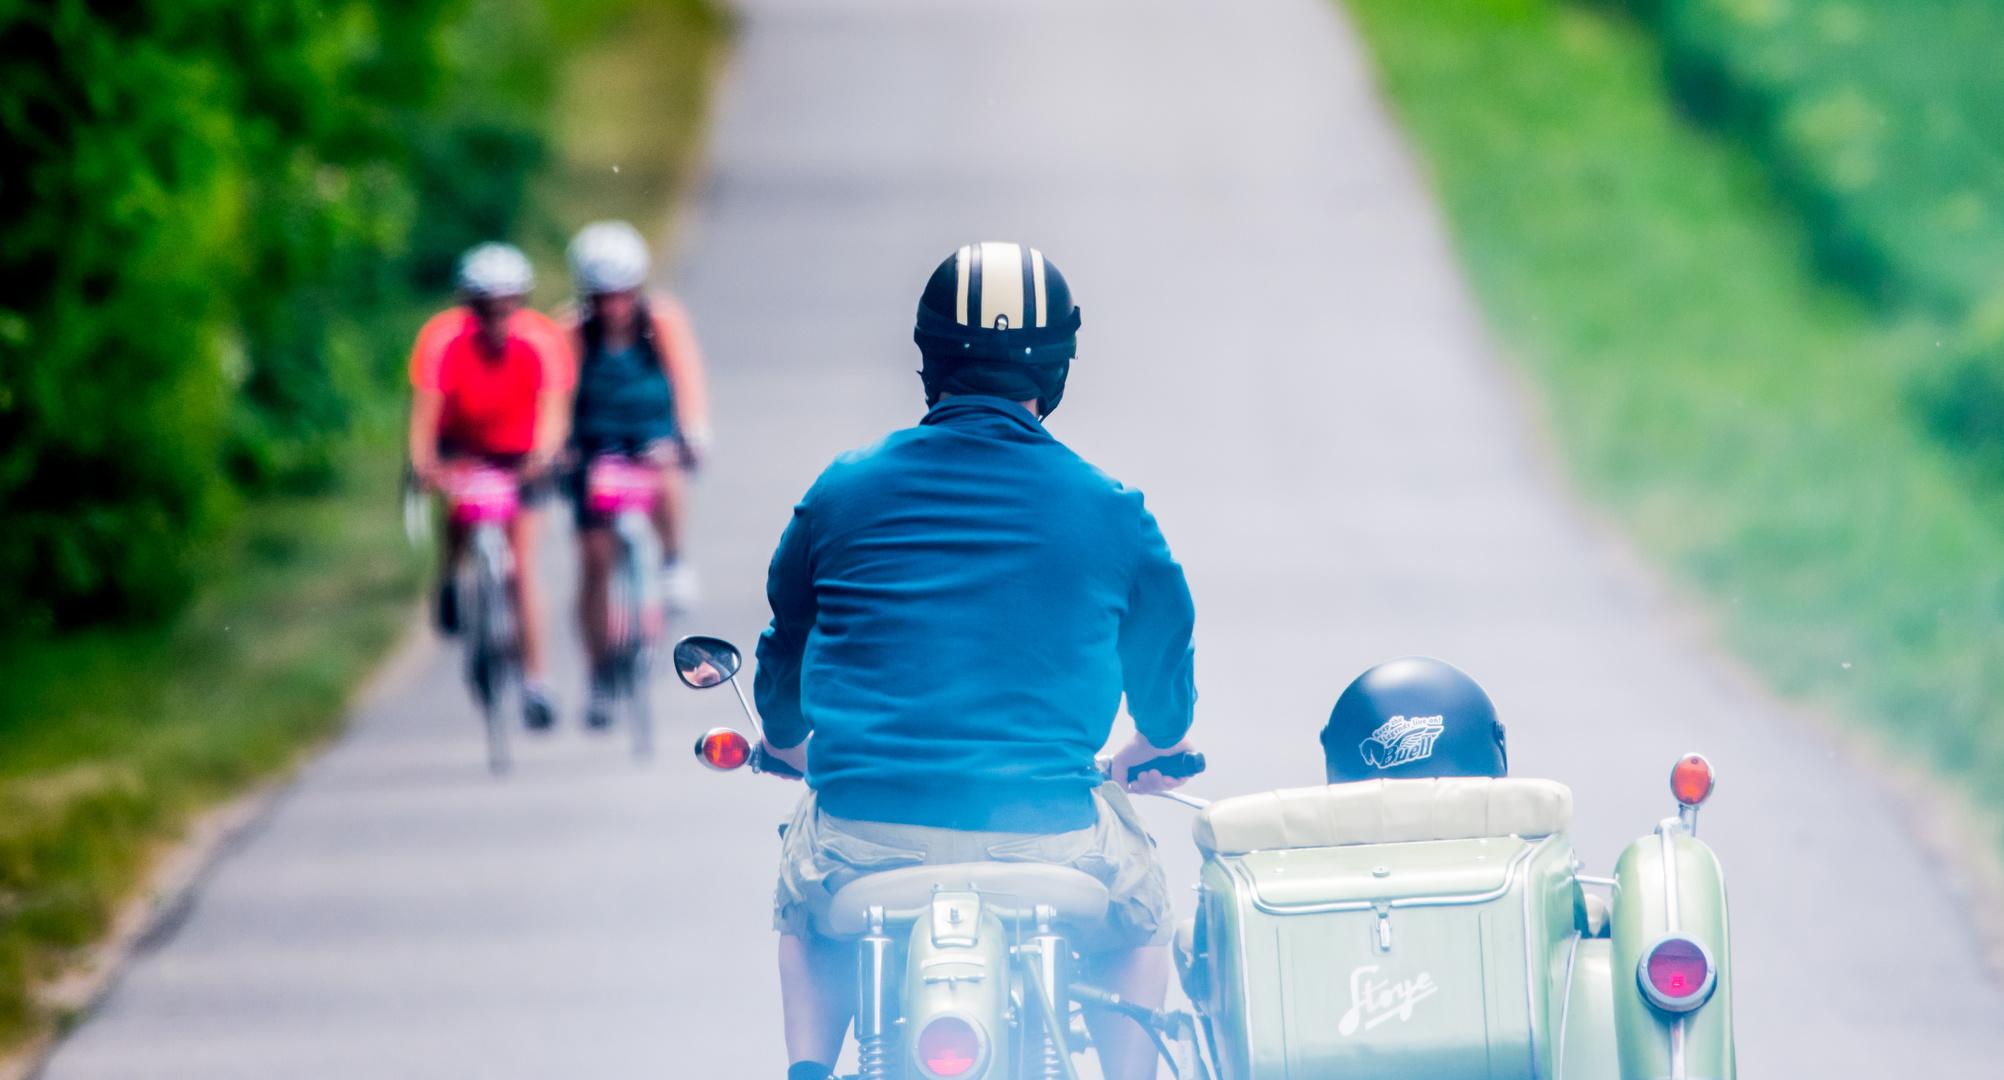 -ride on-